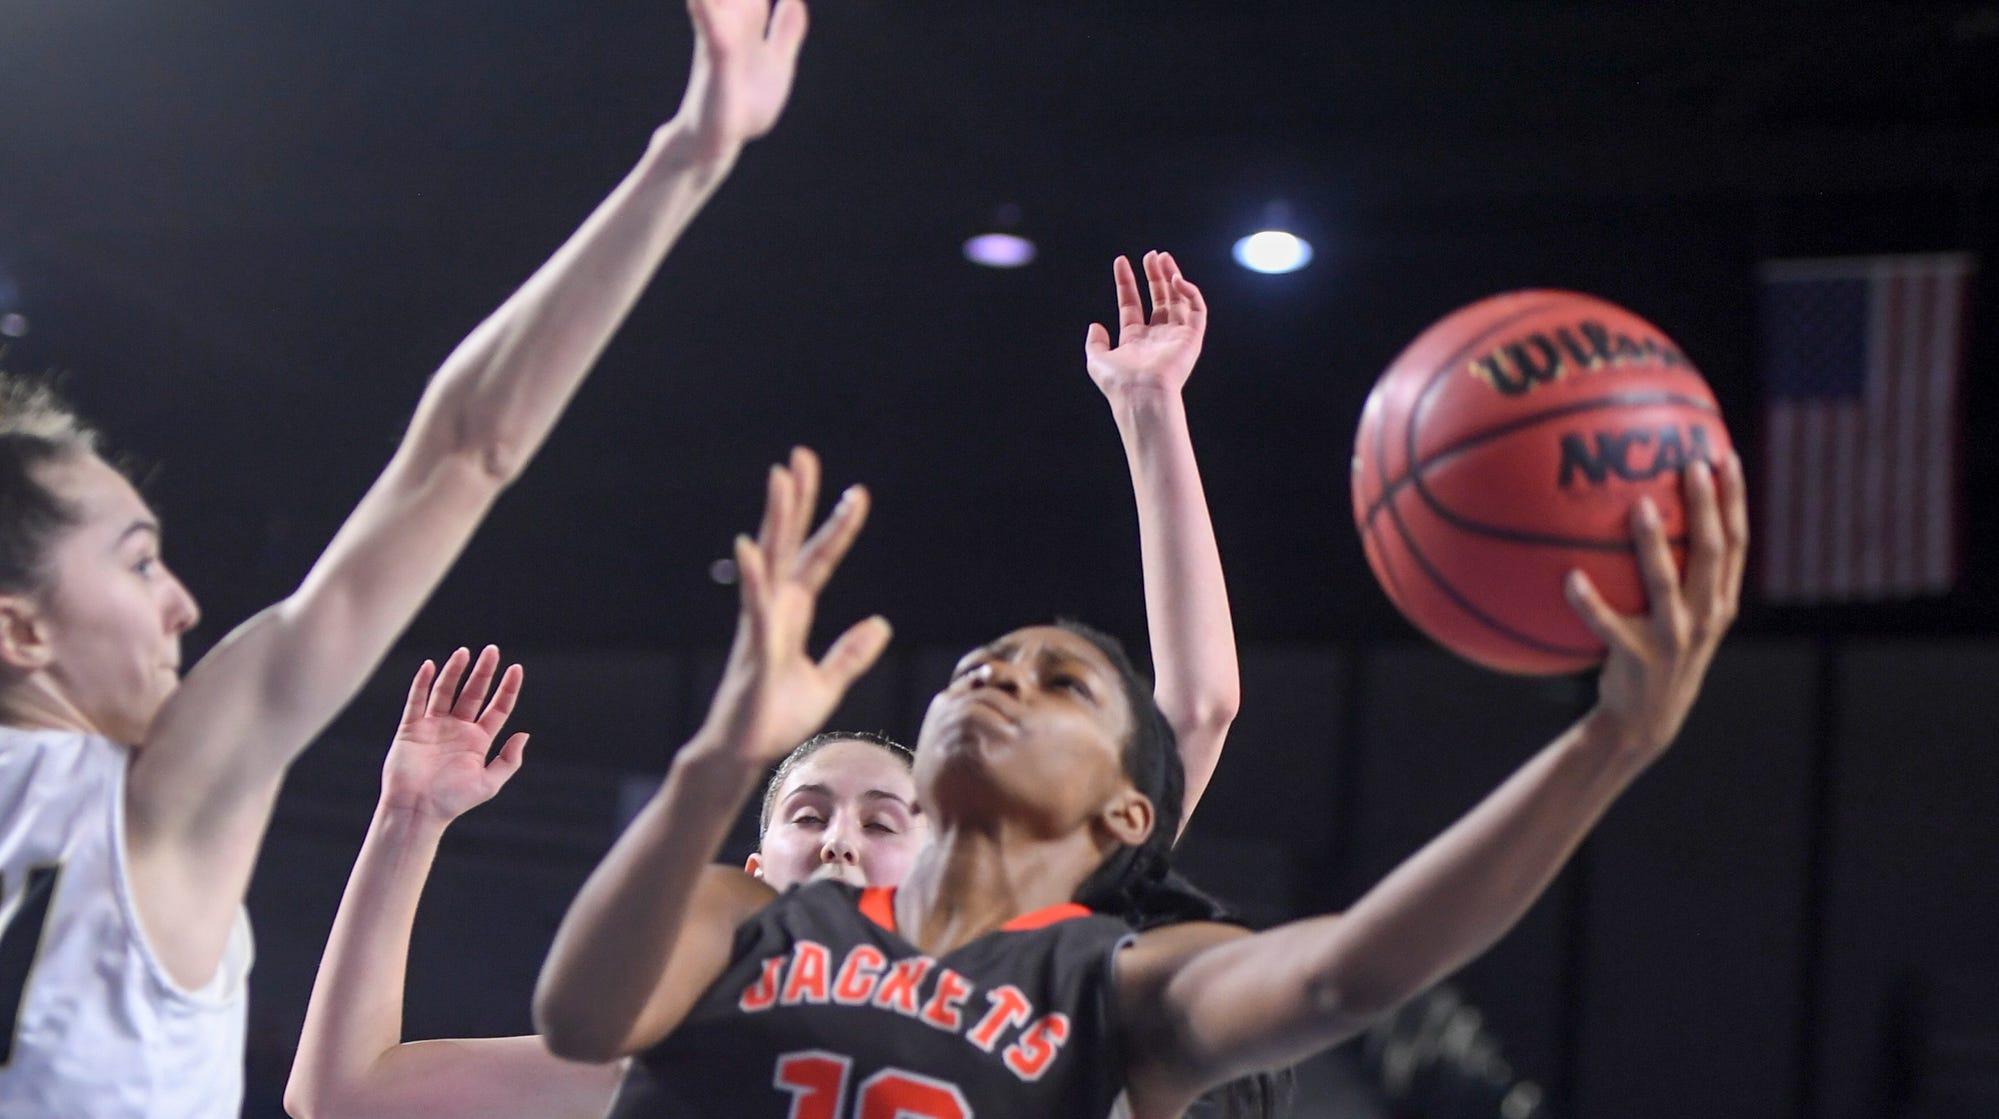 Greenfield is No. 1 in preseason girls basketball rankings